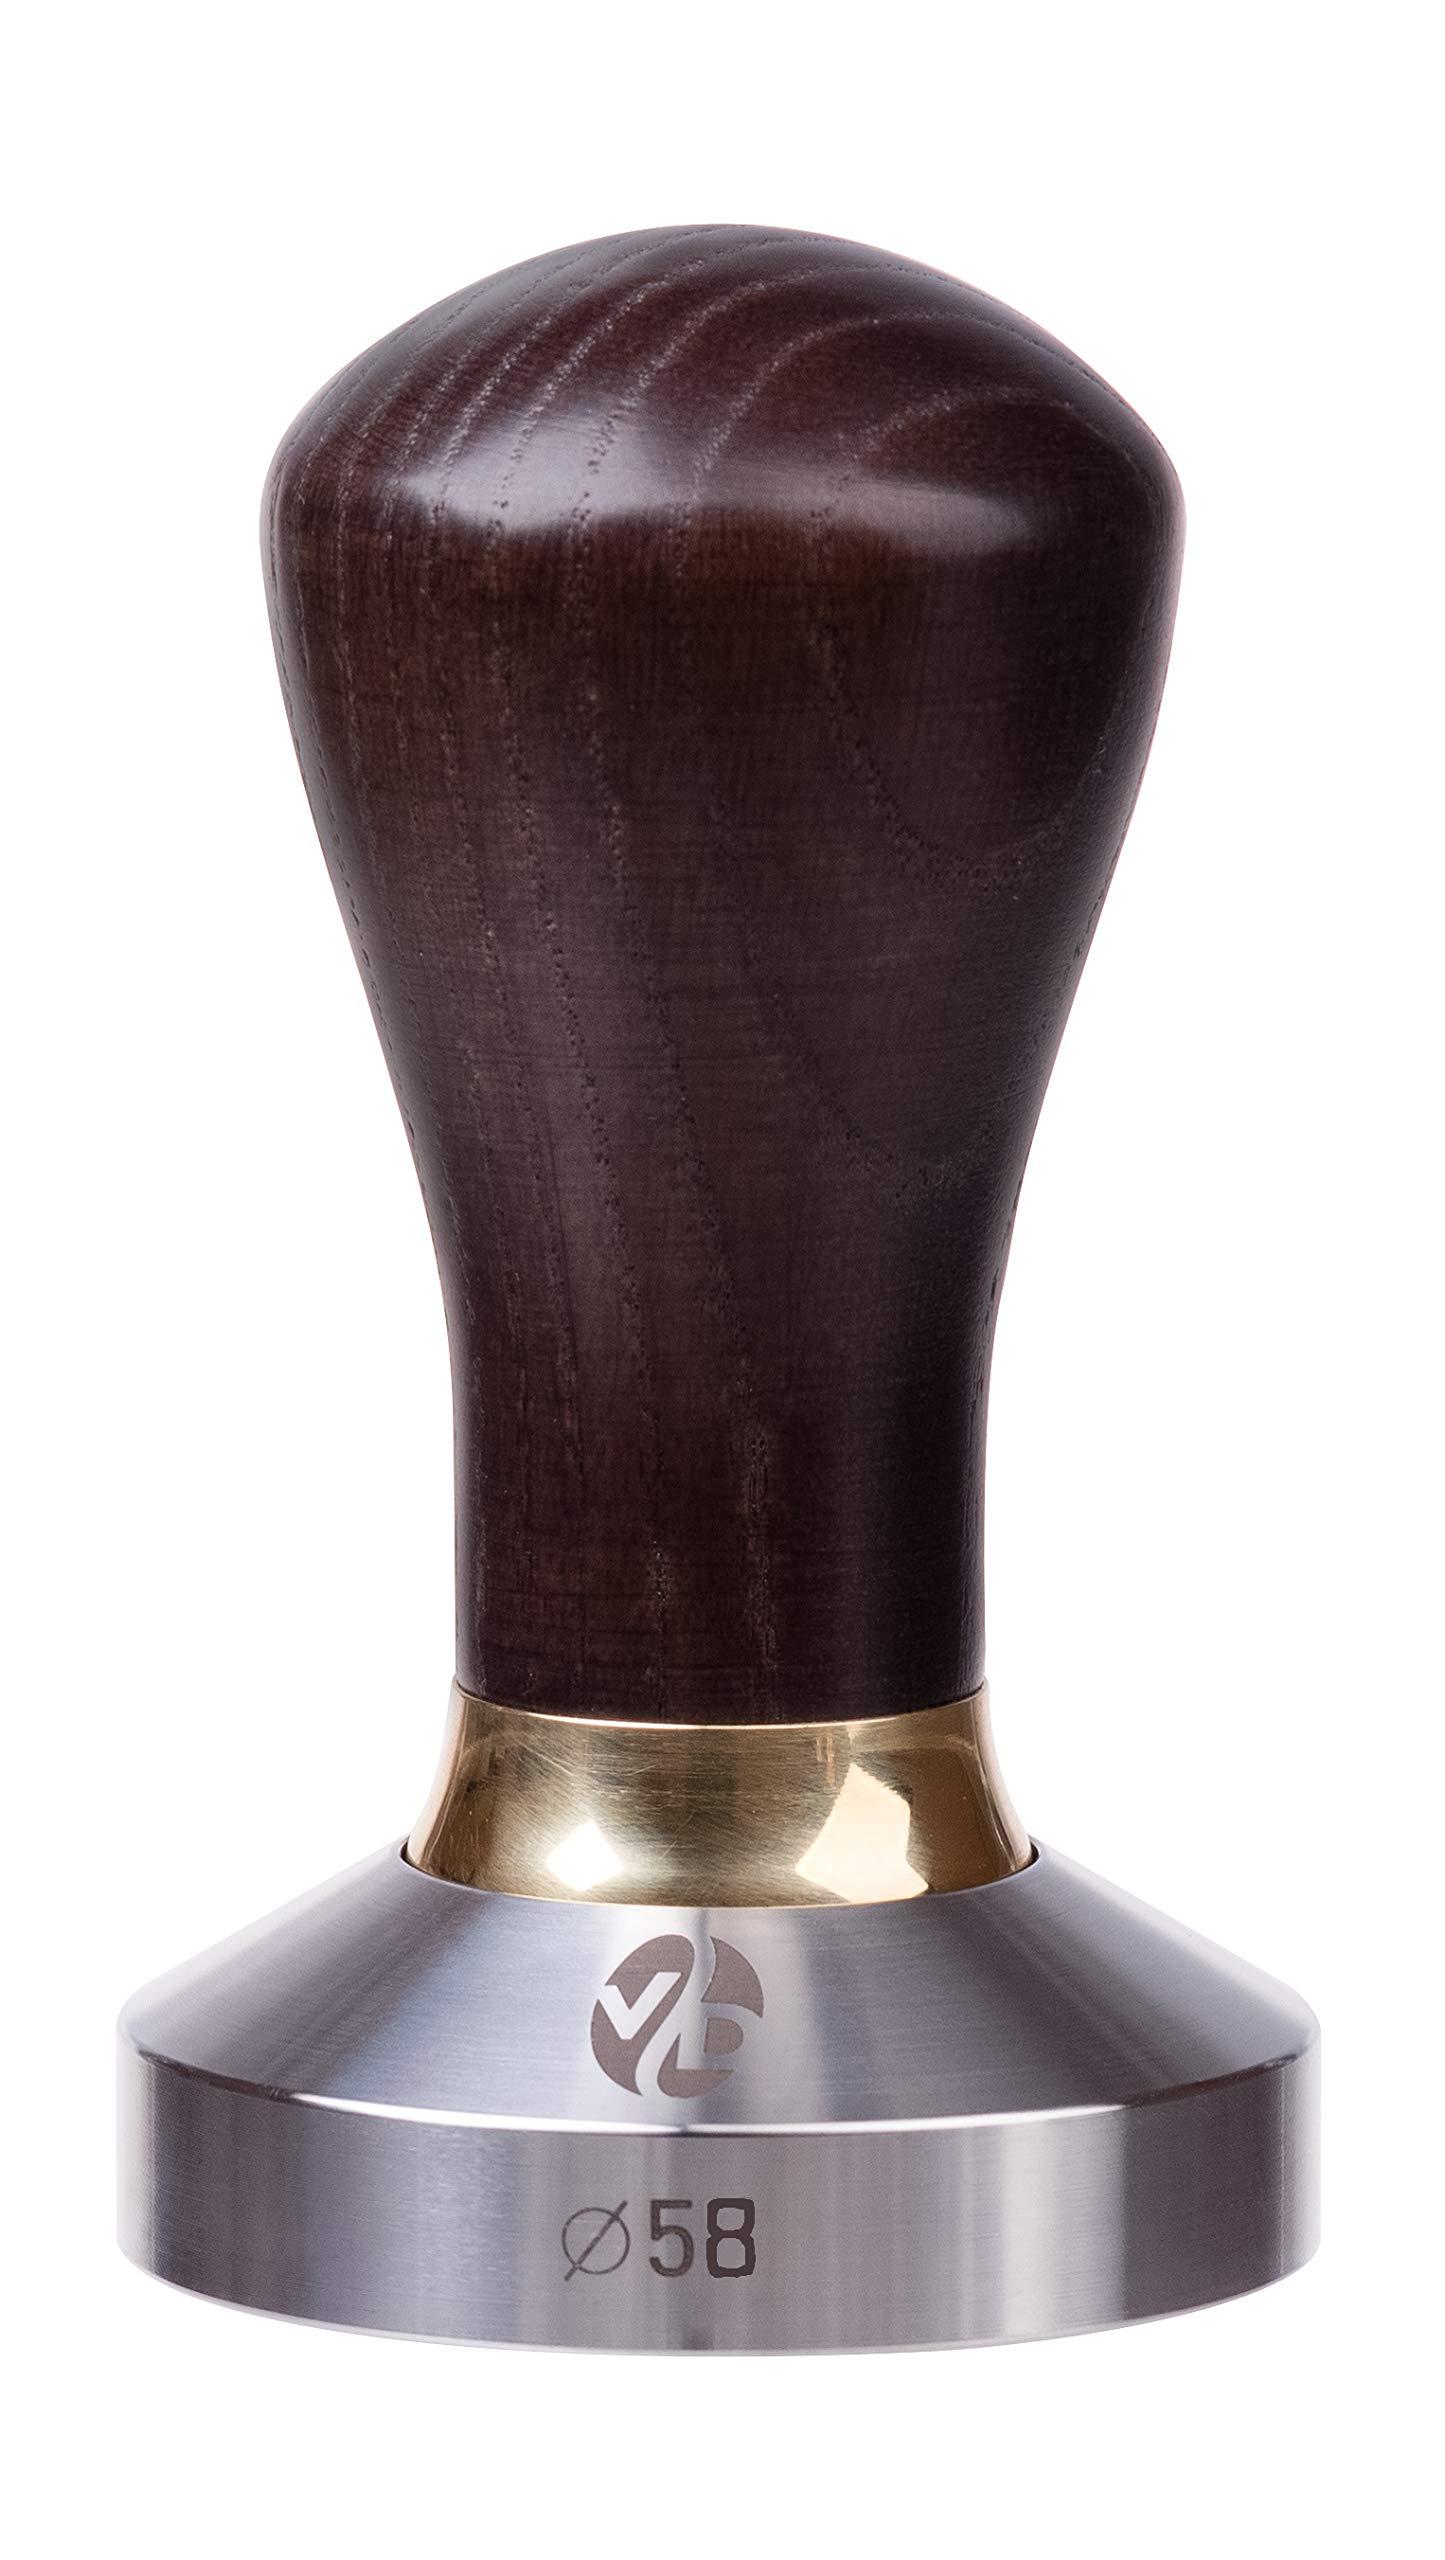 Tamper - Espresso Tamper - 58mm Tamper - Coffee Tamper Premium Series - Coffee Press Tool - Tamper Espresso - Stainless Steel Espresso Tamper - Handle Solid Wood - Pressure Base Tampers (venge, 58mm)